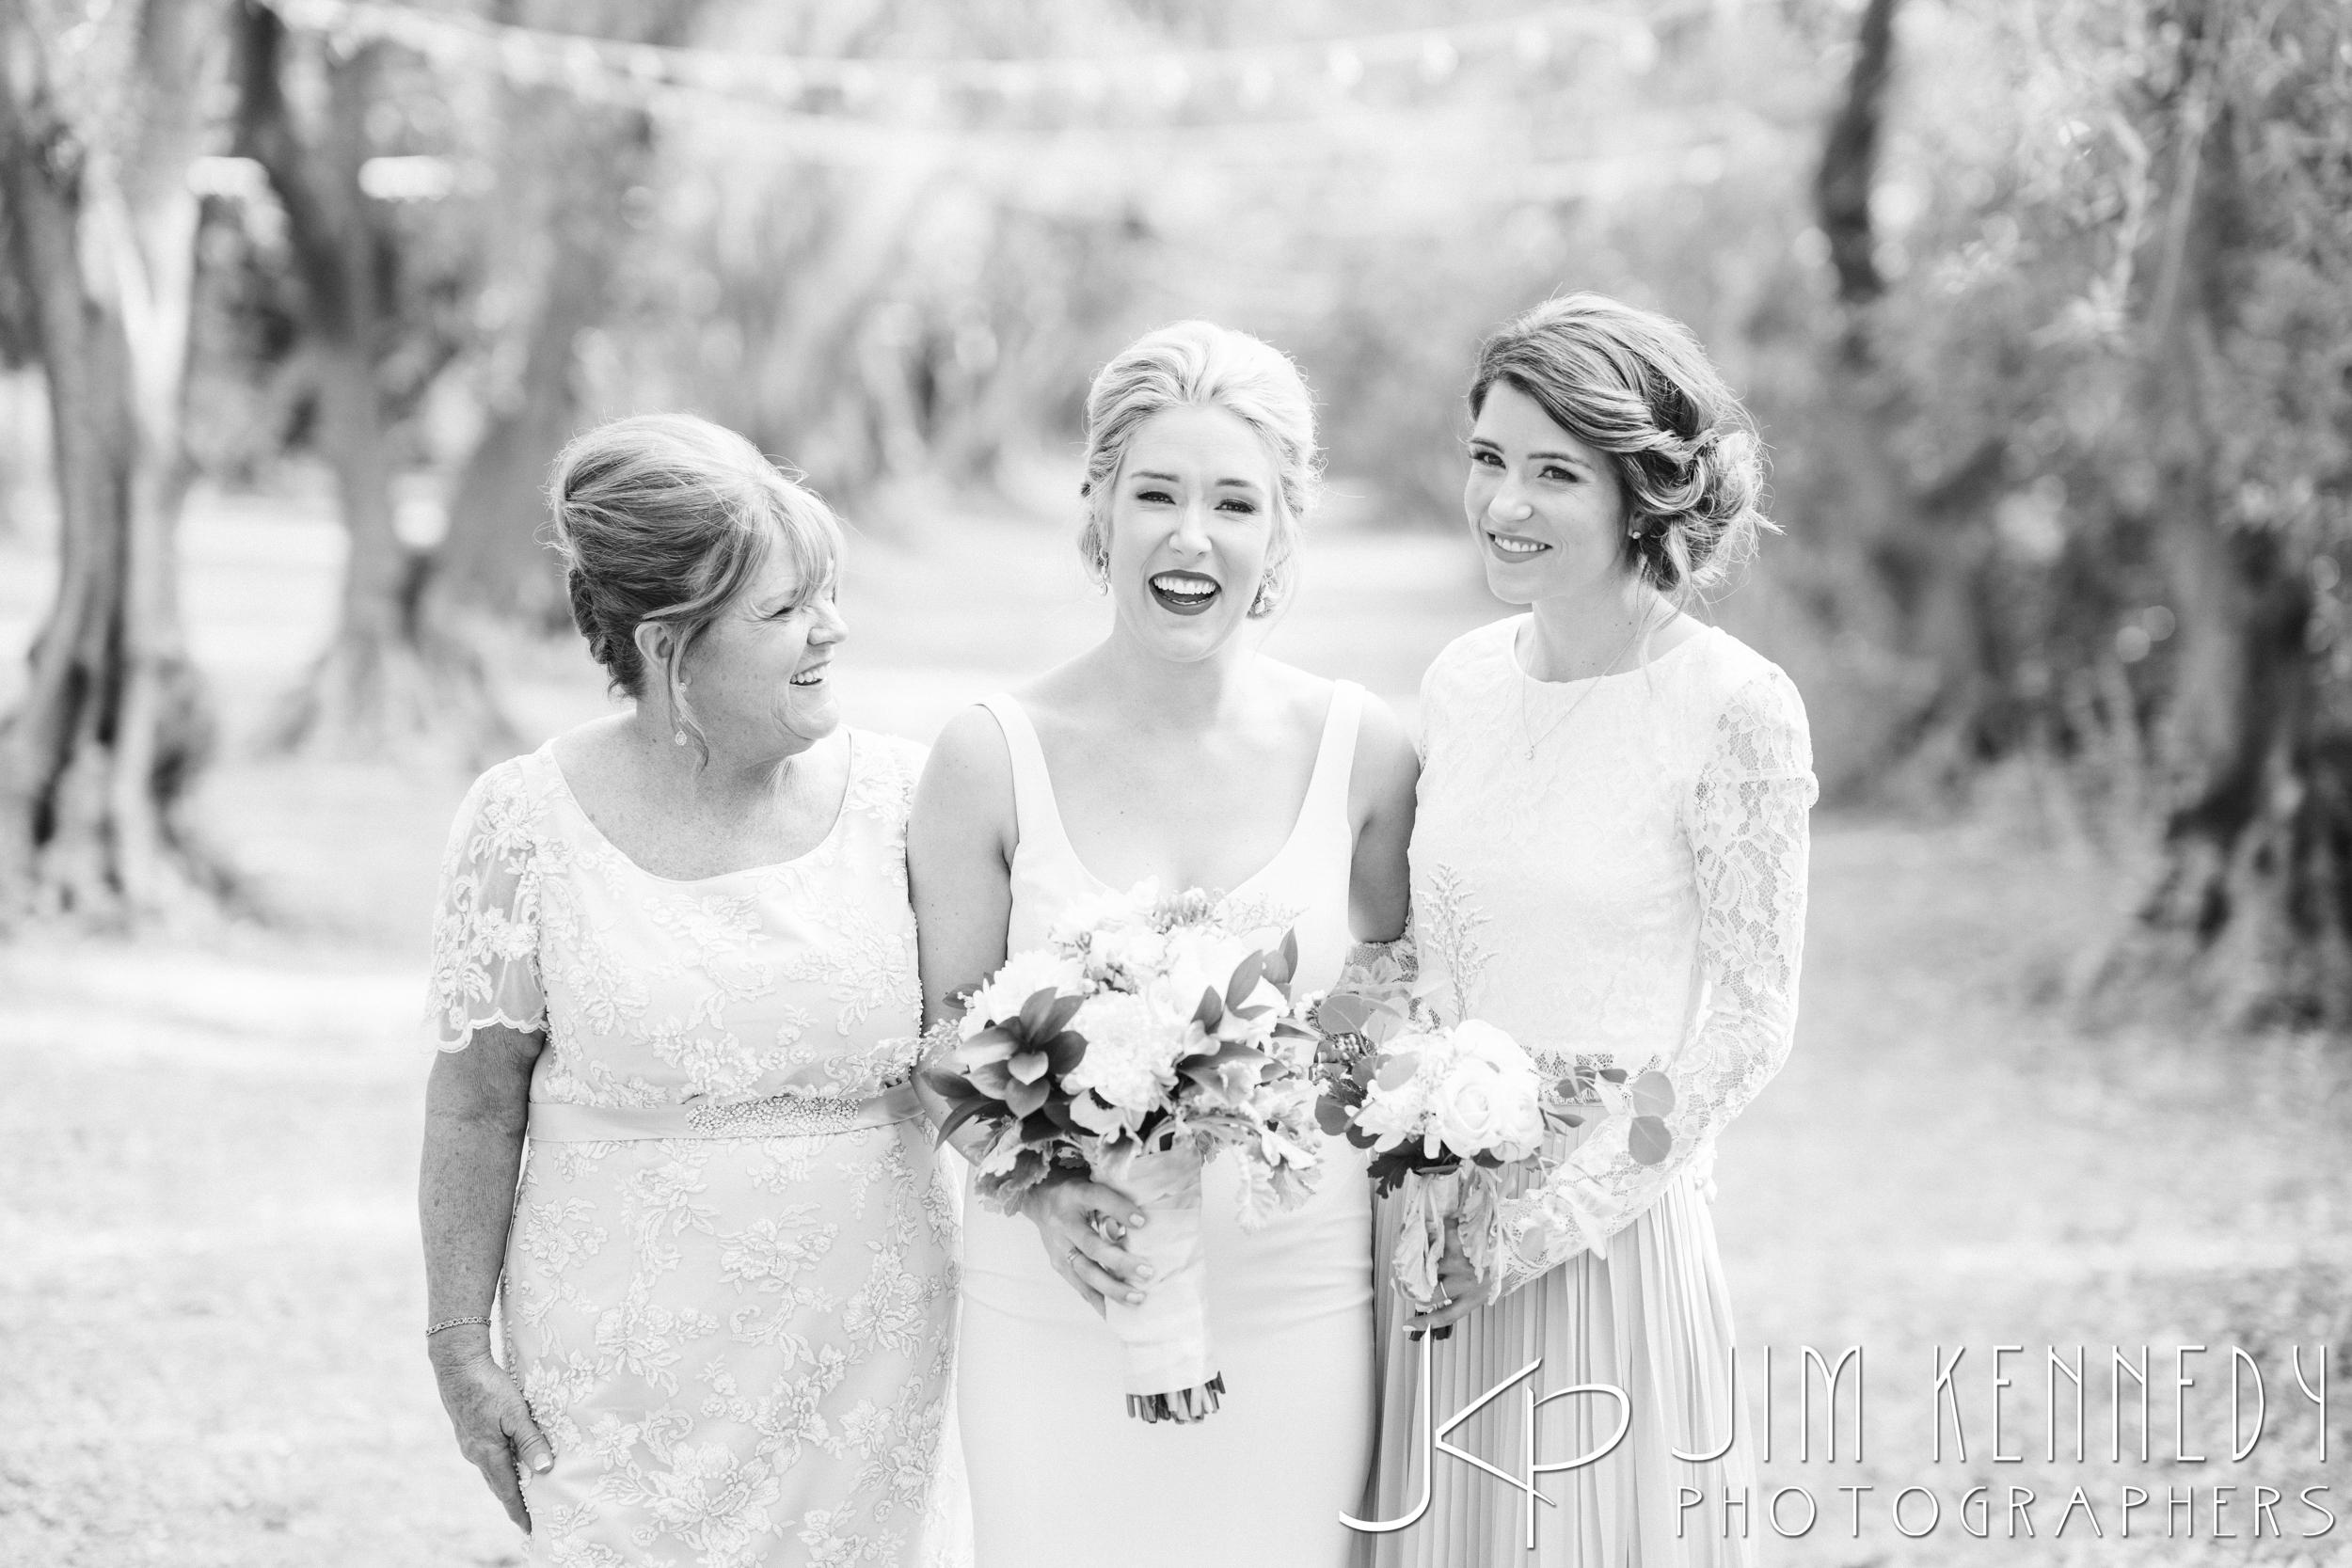 jim_kennedy_photographers_highland_springs_wedding_caitlyn_0072.jpg